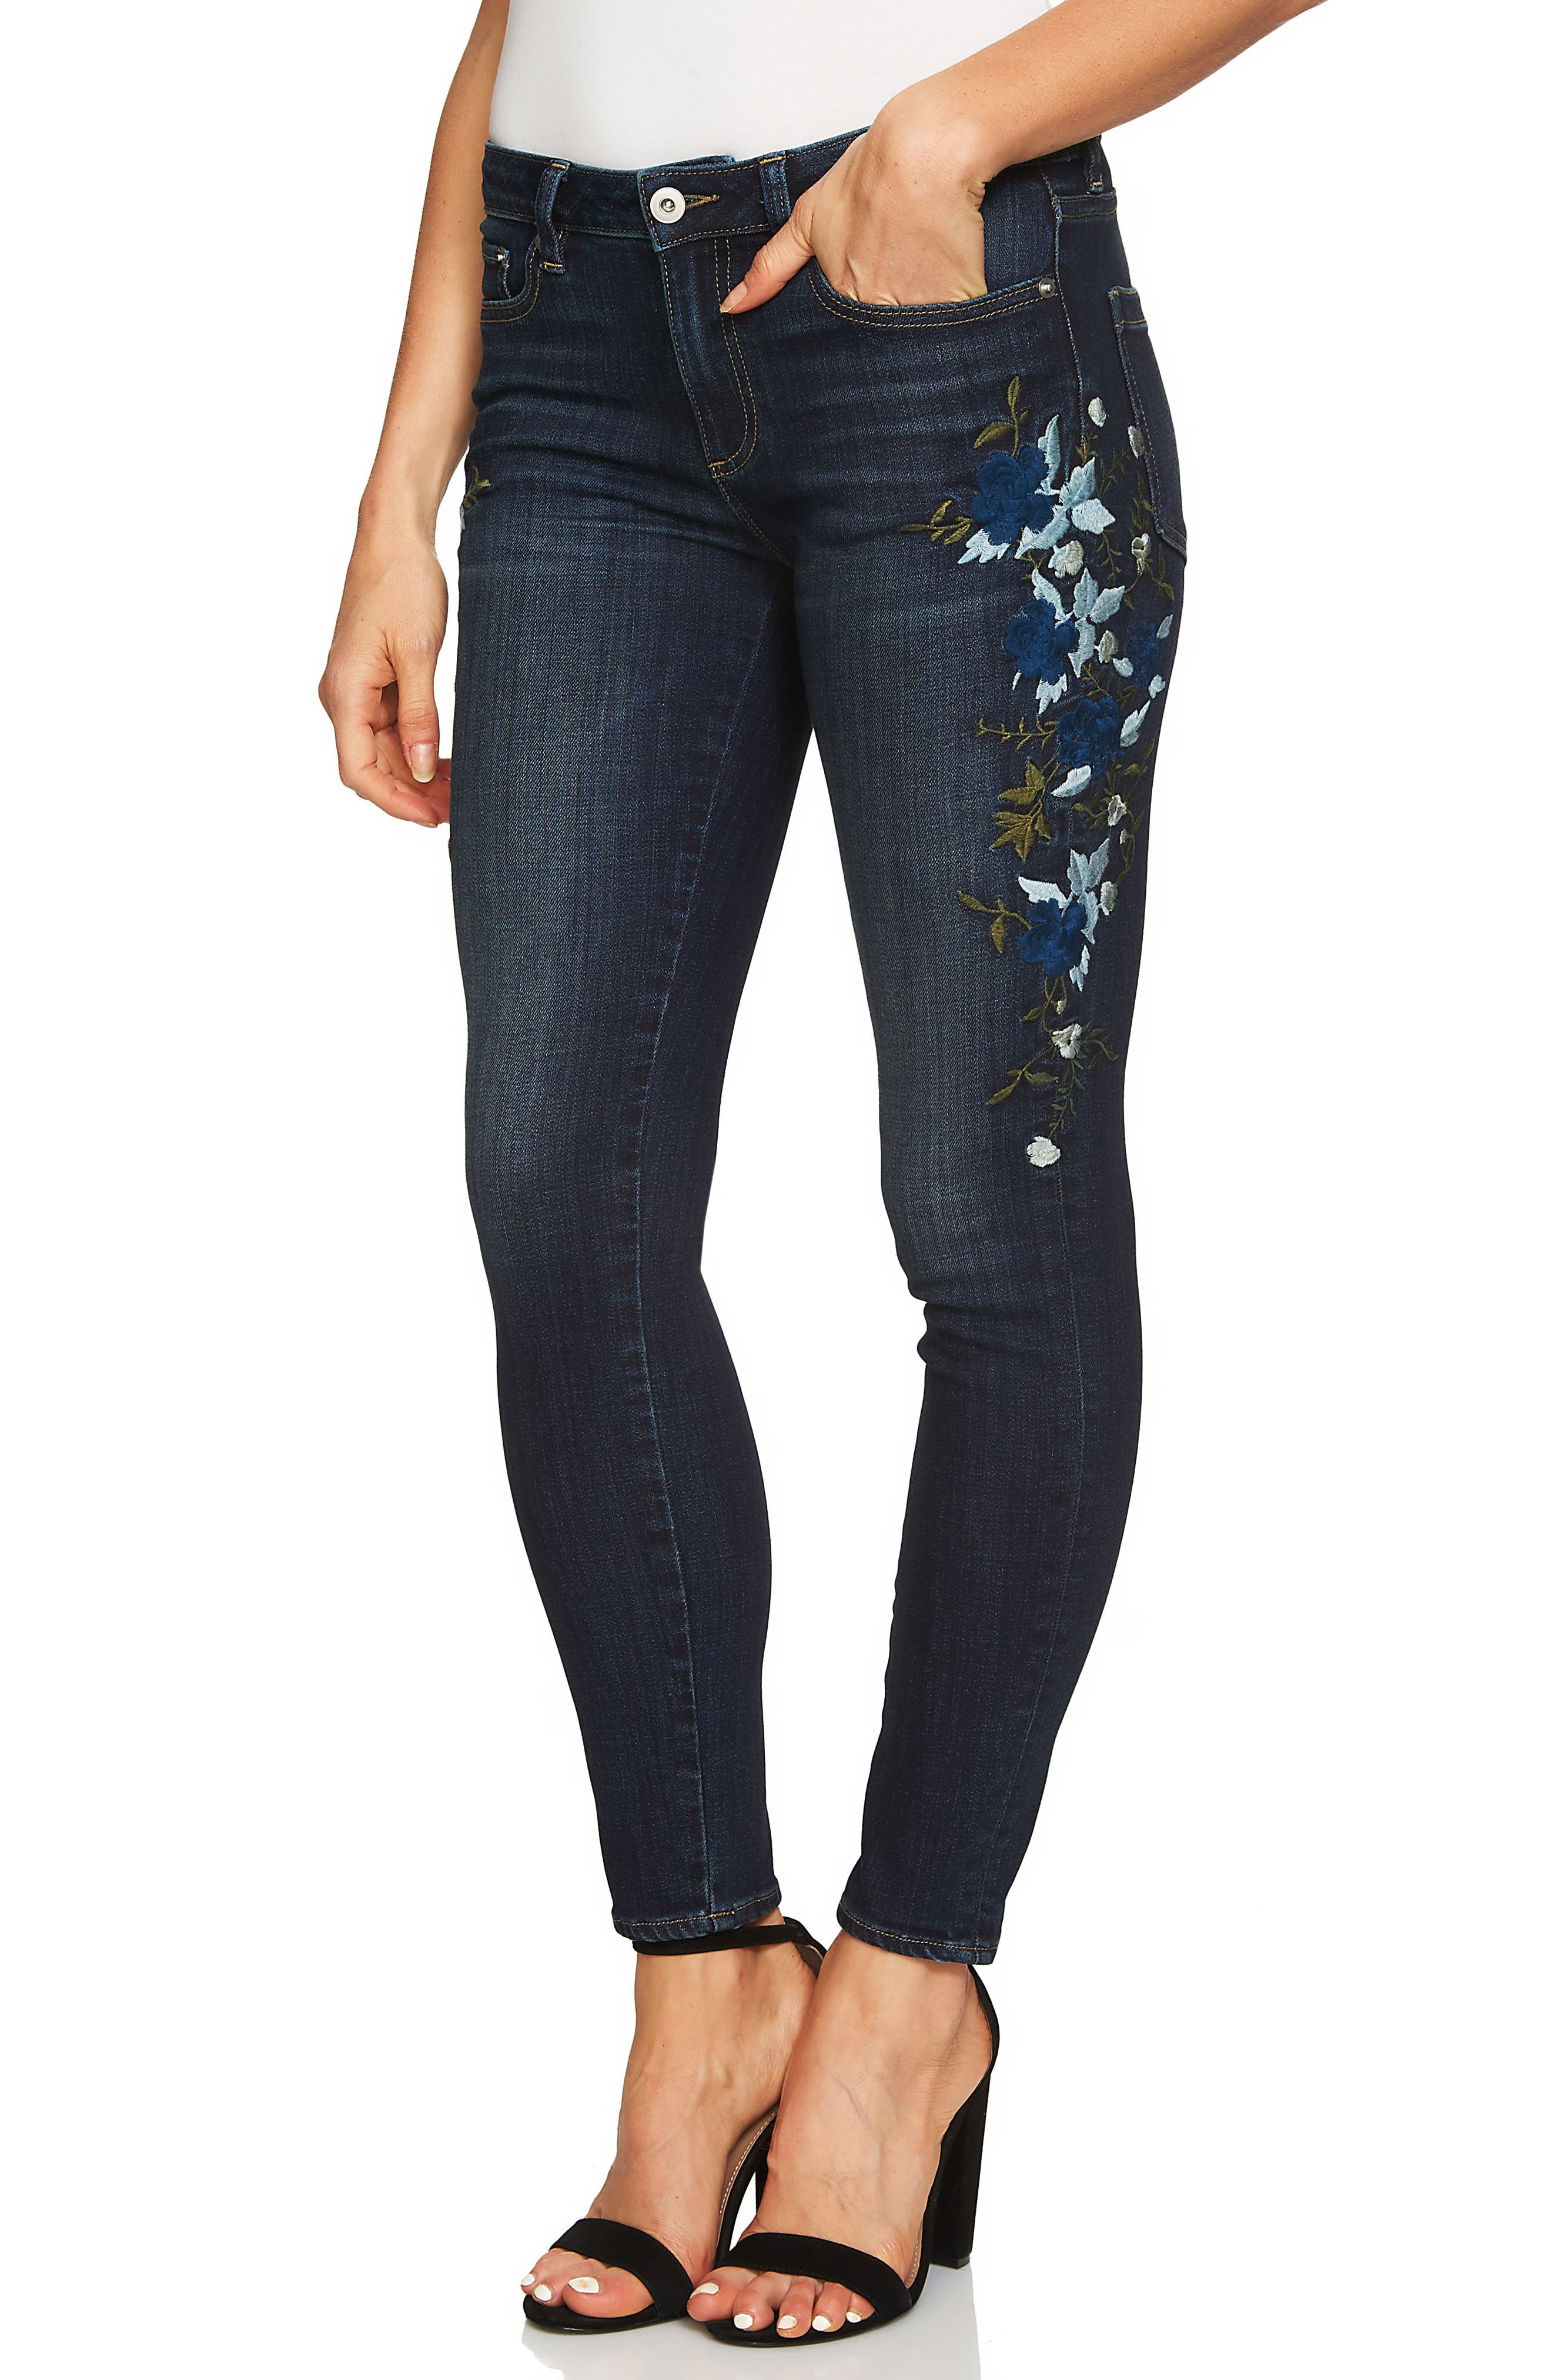 Indigo Denim Floral Embroidered Jeans,                         Main,                         color, 428